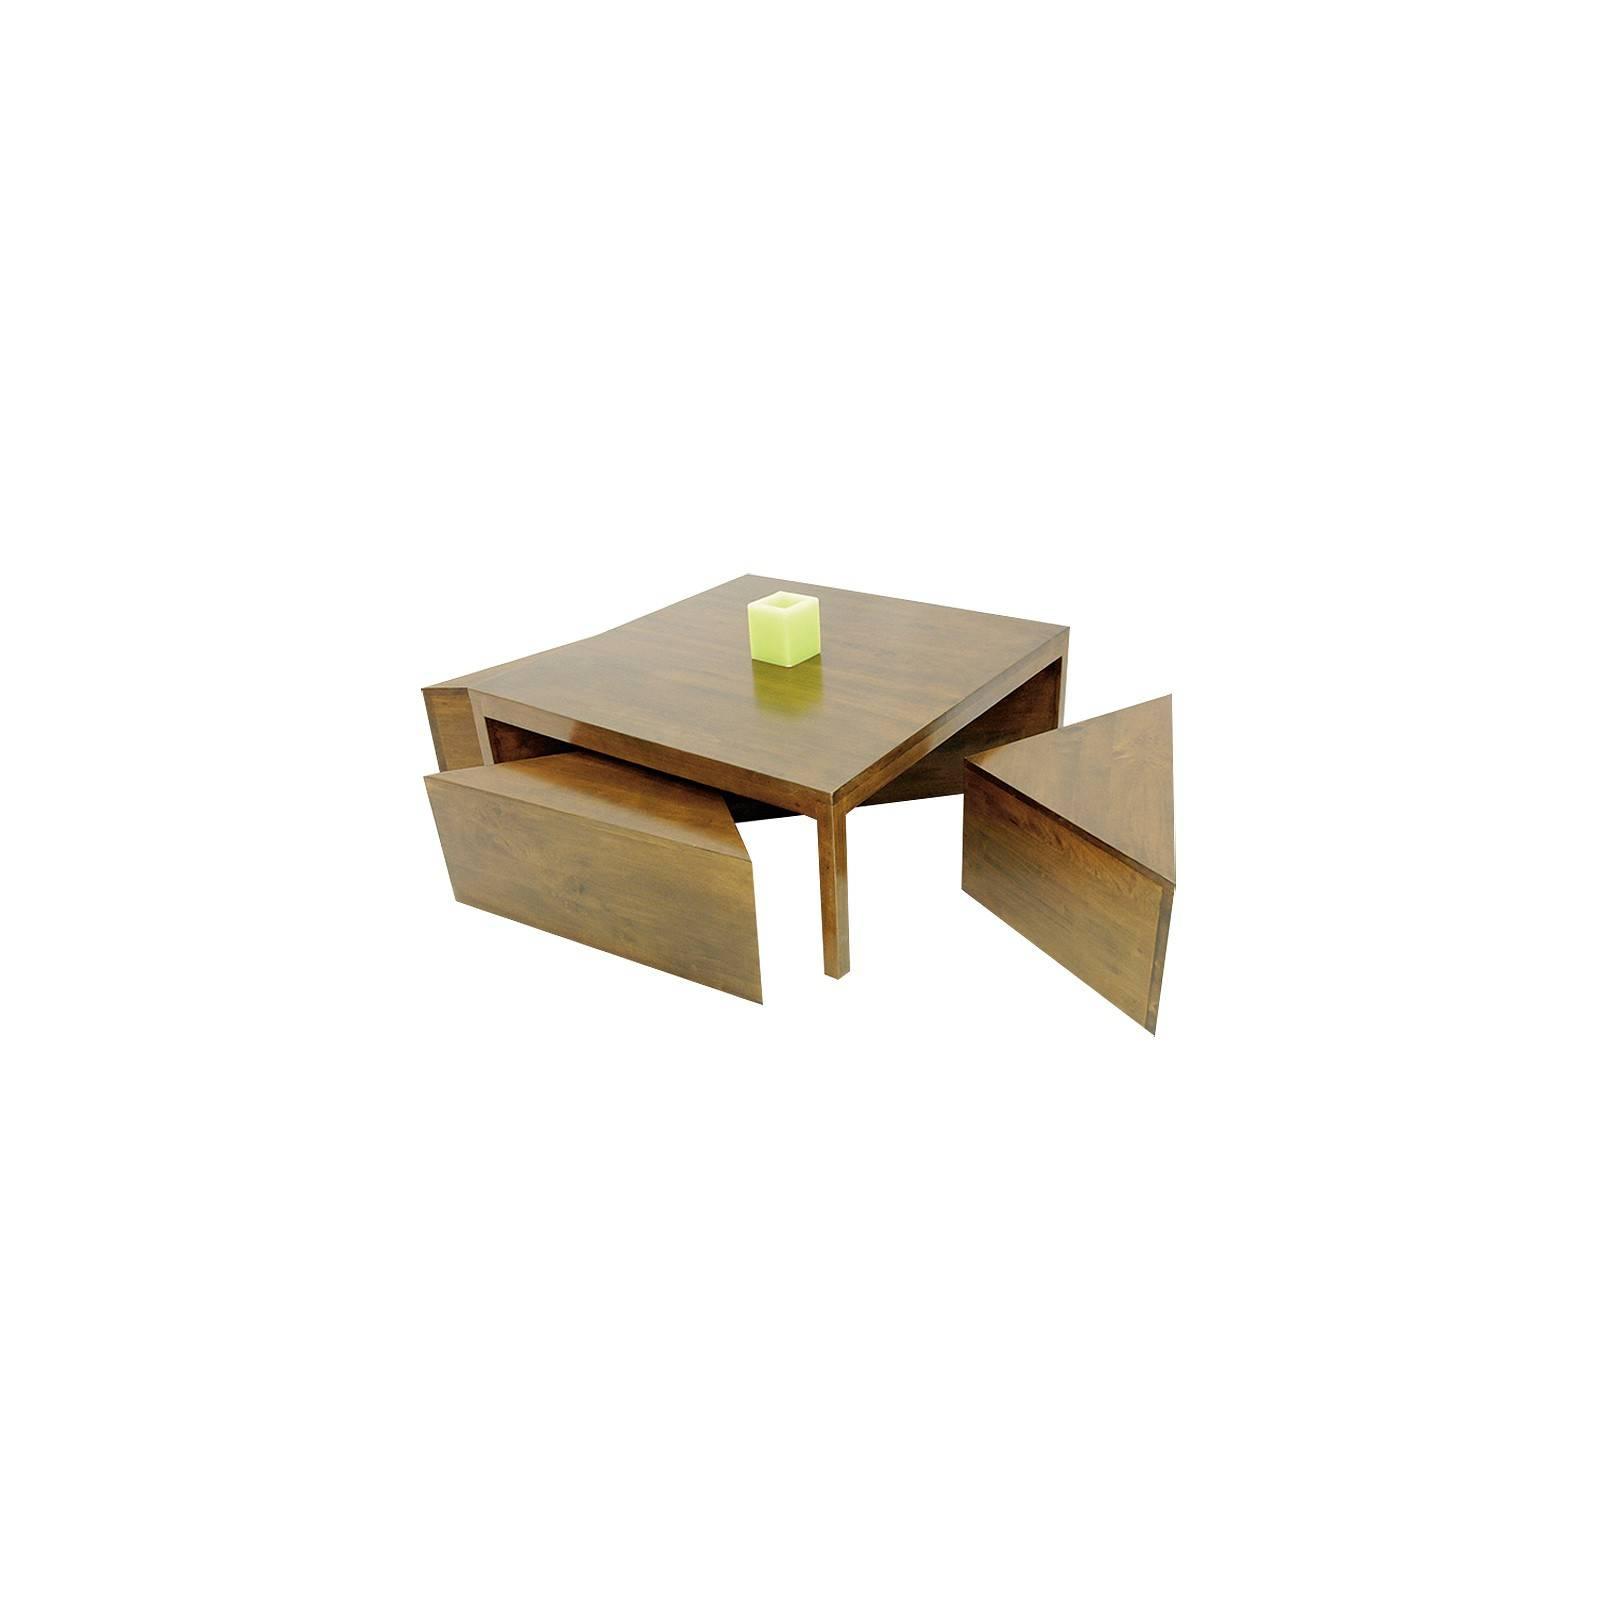 Table basse et ses quatres tabourets design Omega